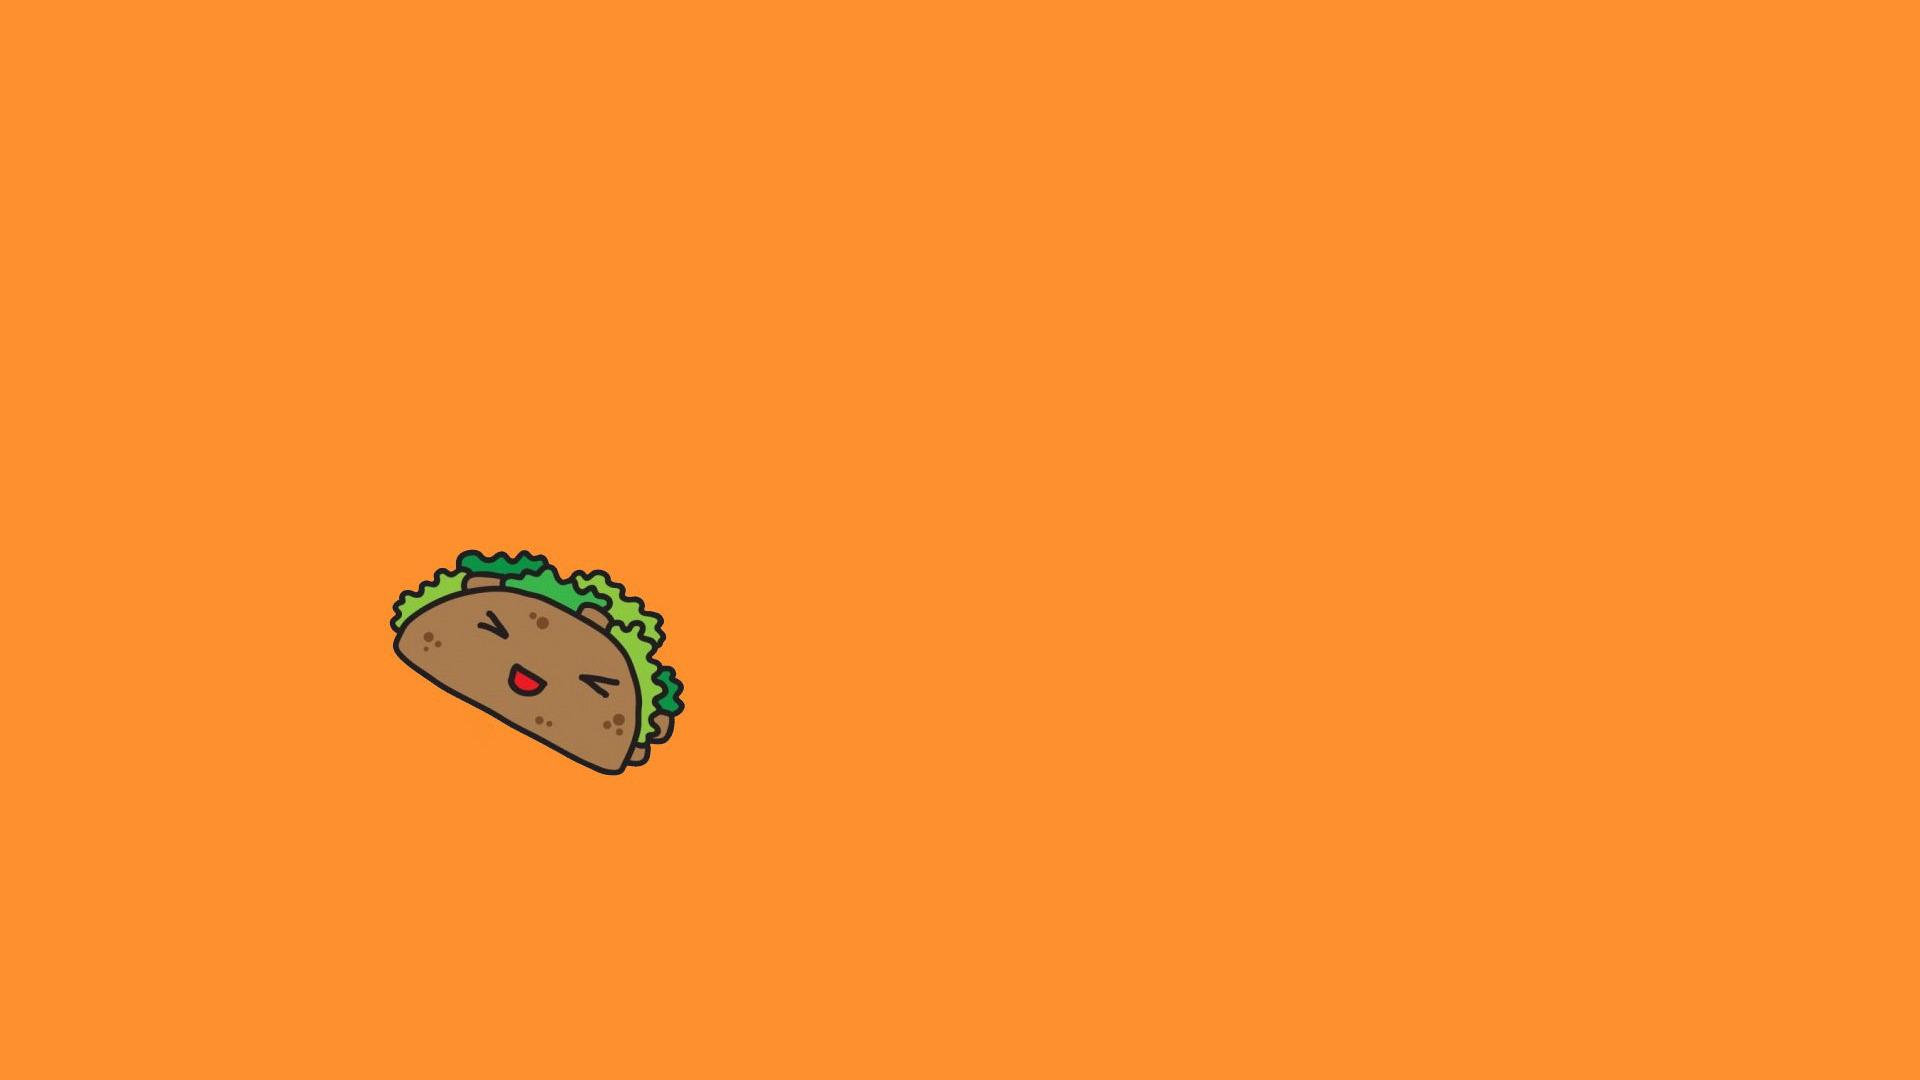 Free download Happy taco Wallpaper 6705